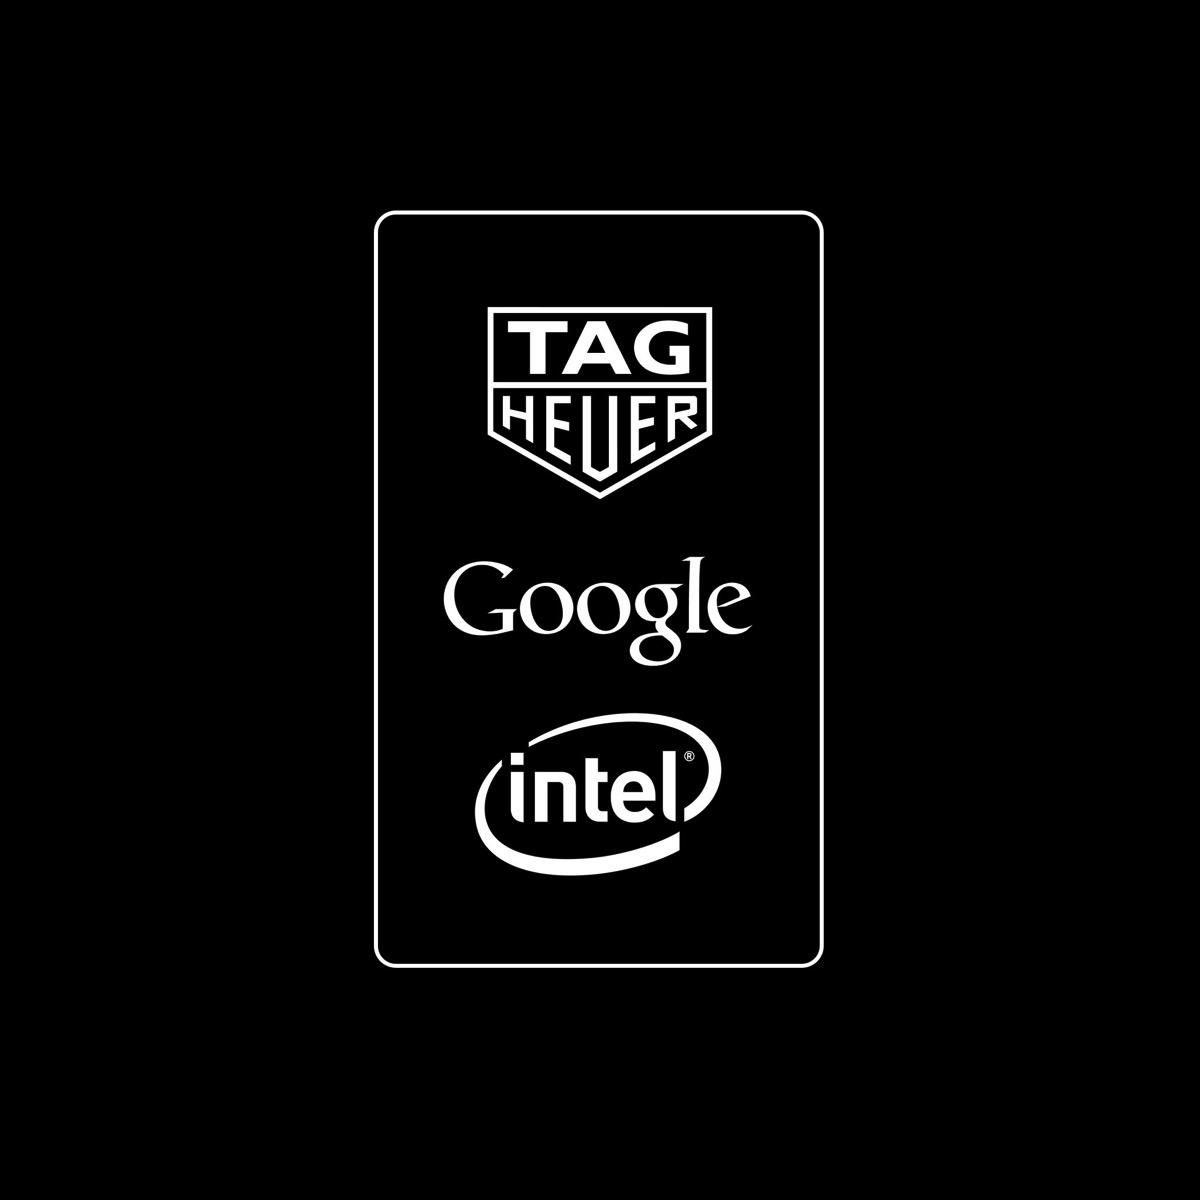 Tag heuer intel google